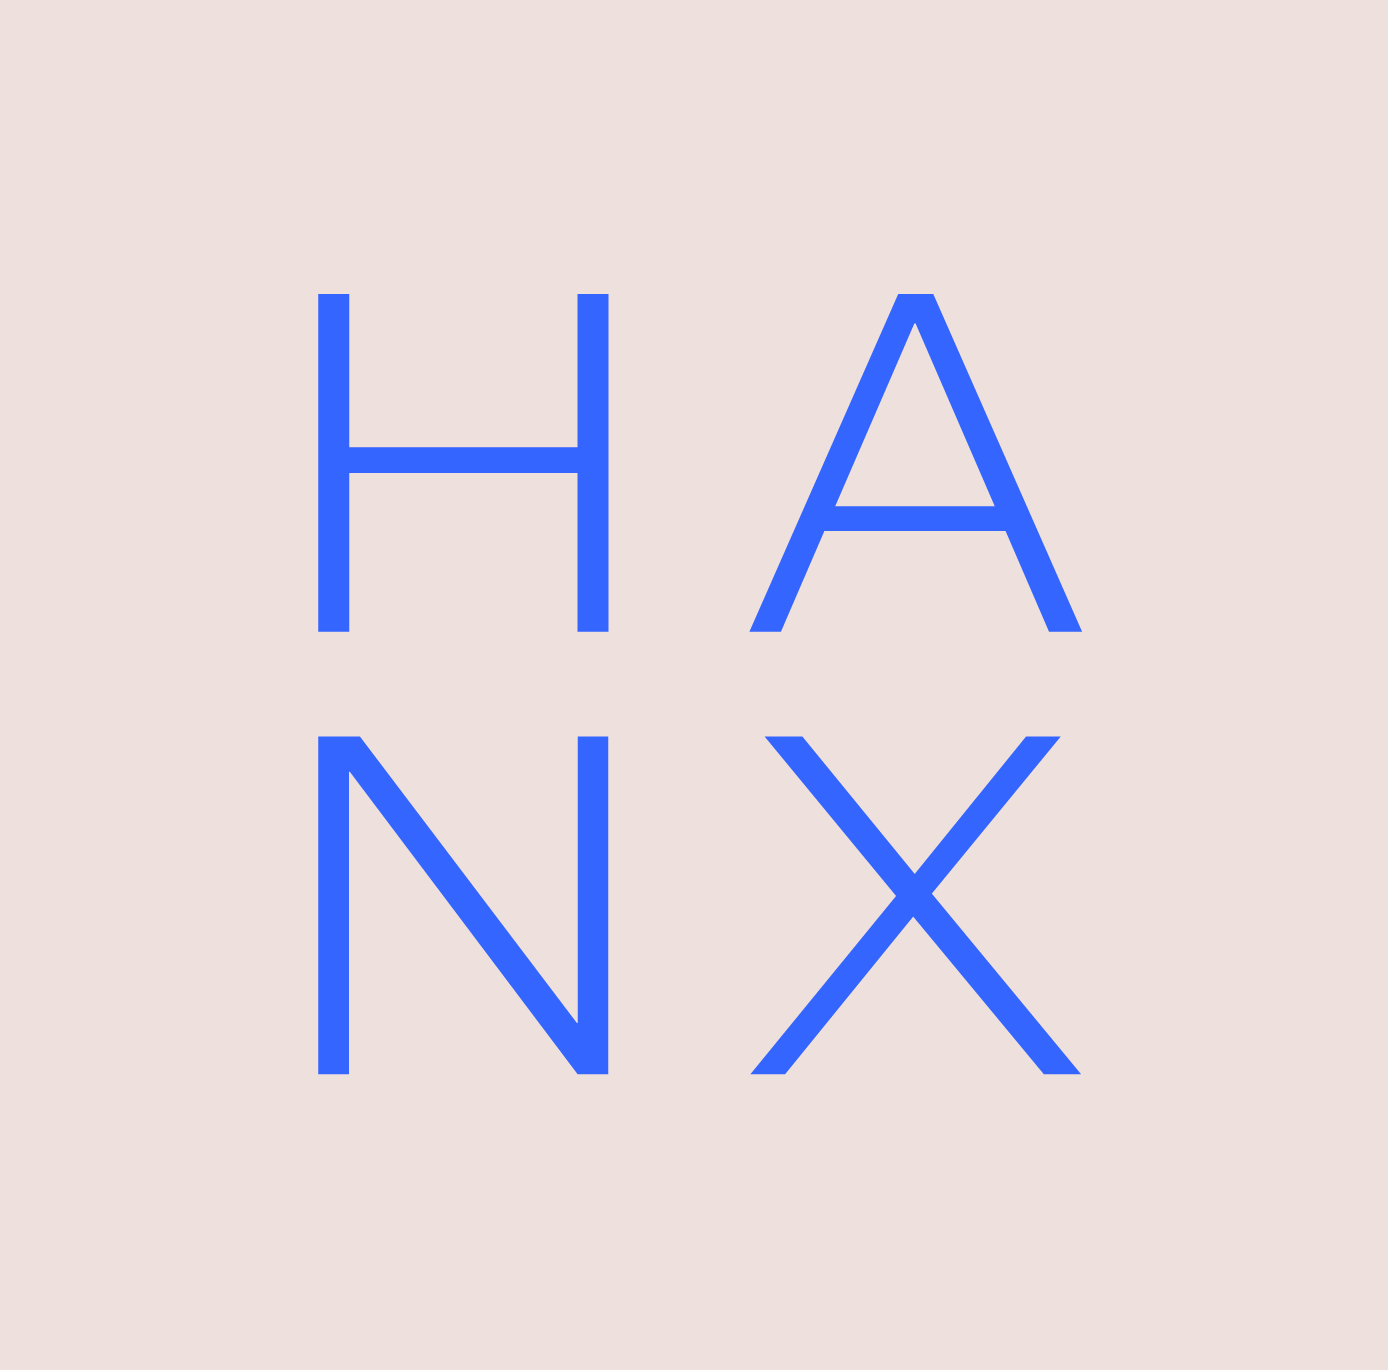 Hanx_Logo_square-01.png